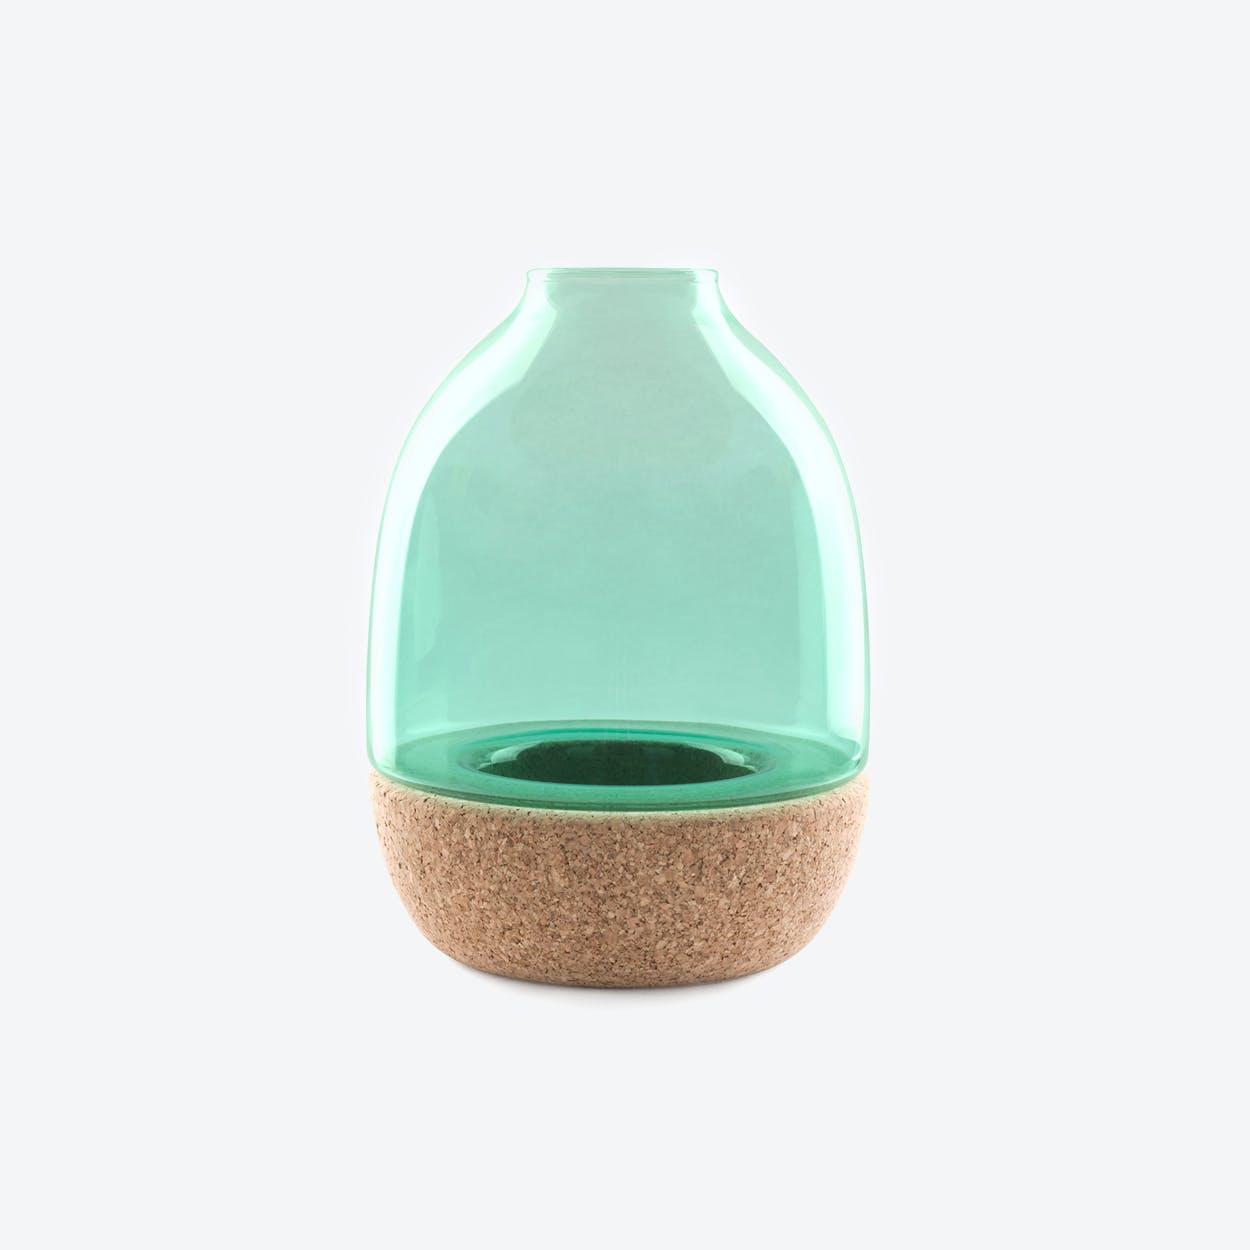 Pitaro Vase in Turquoise Glass